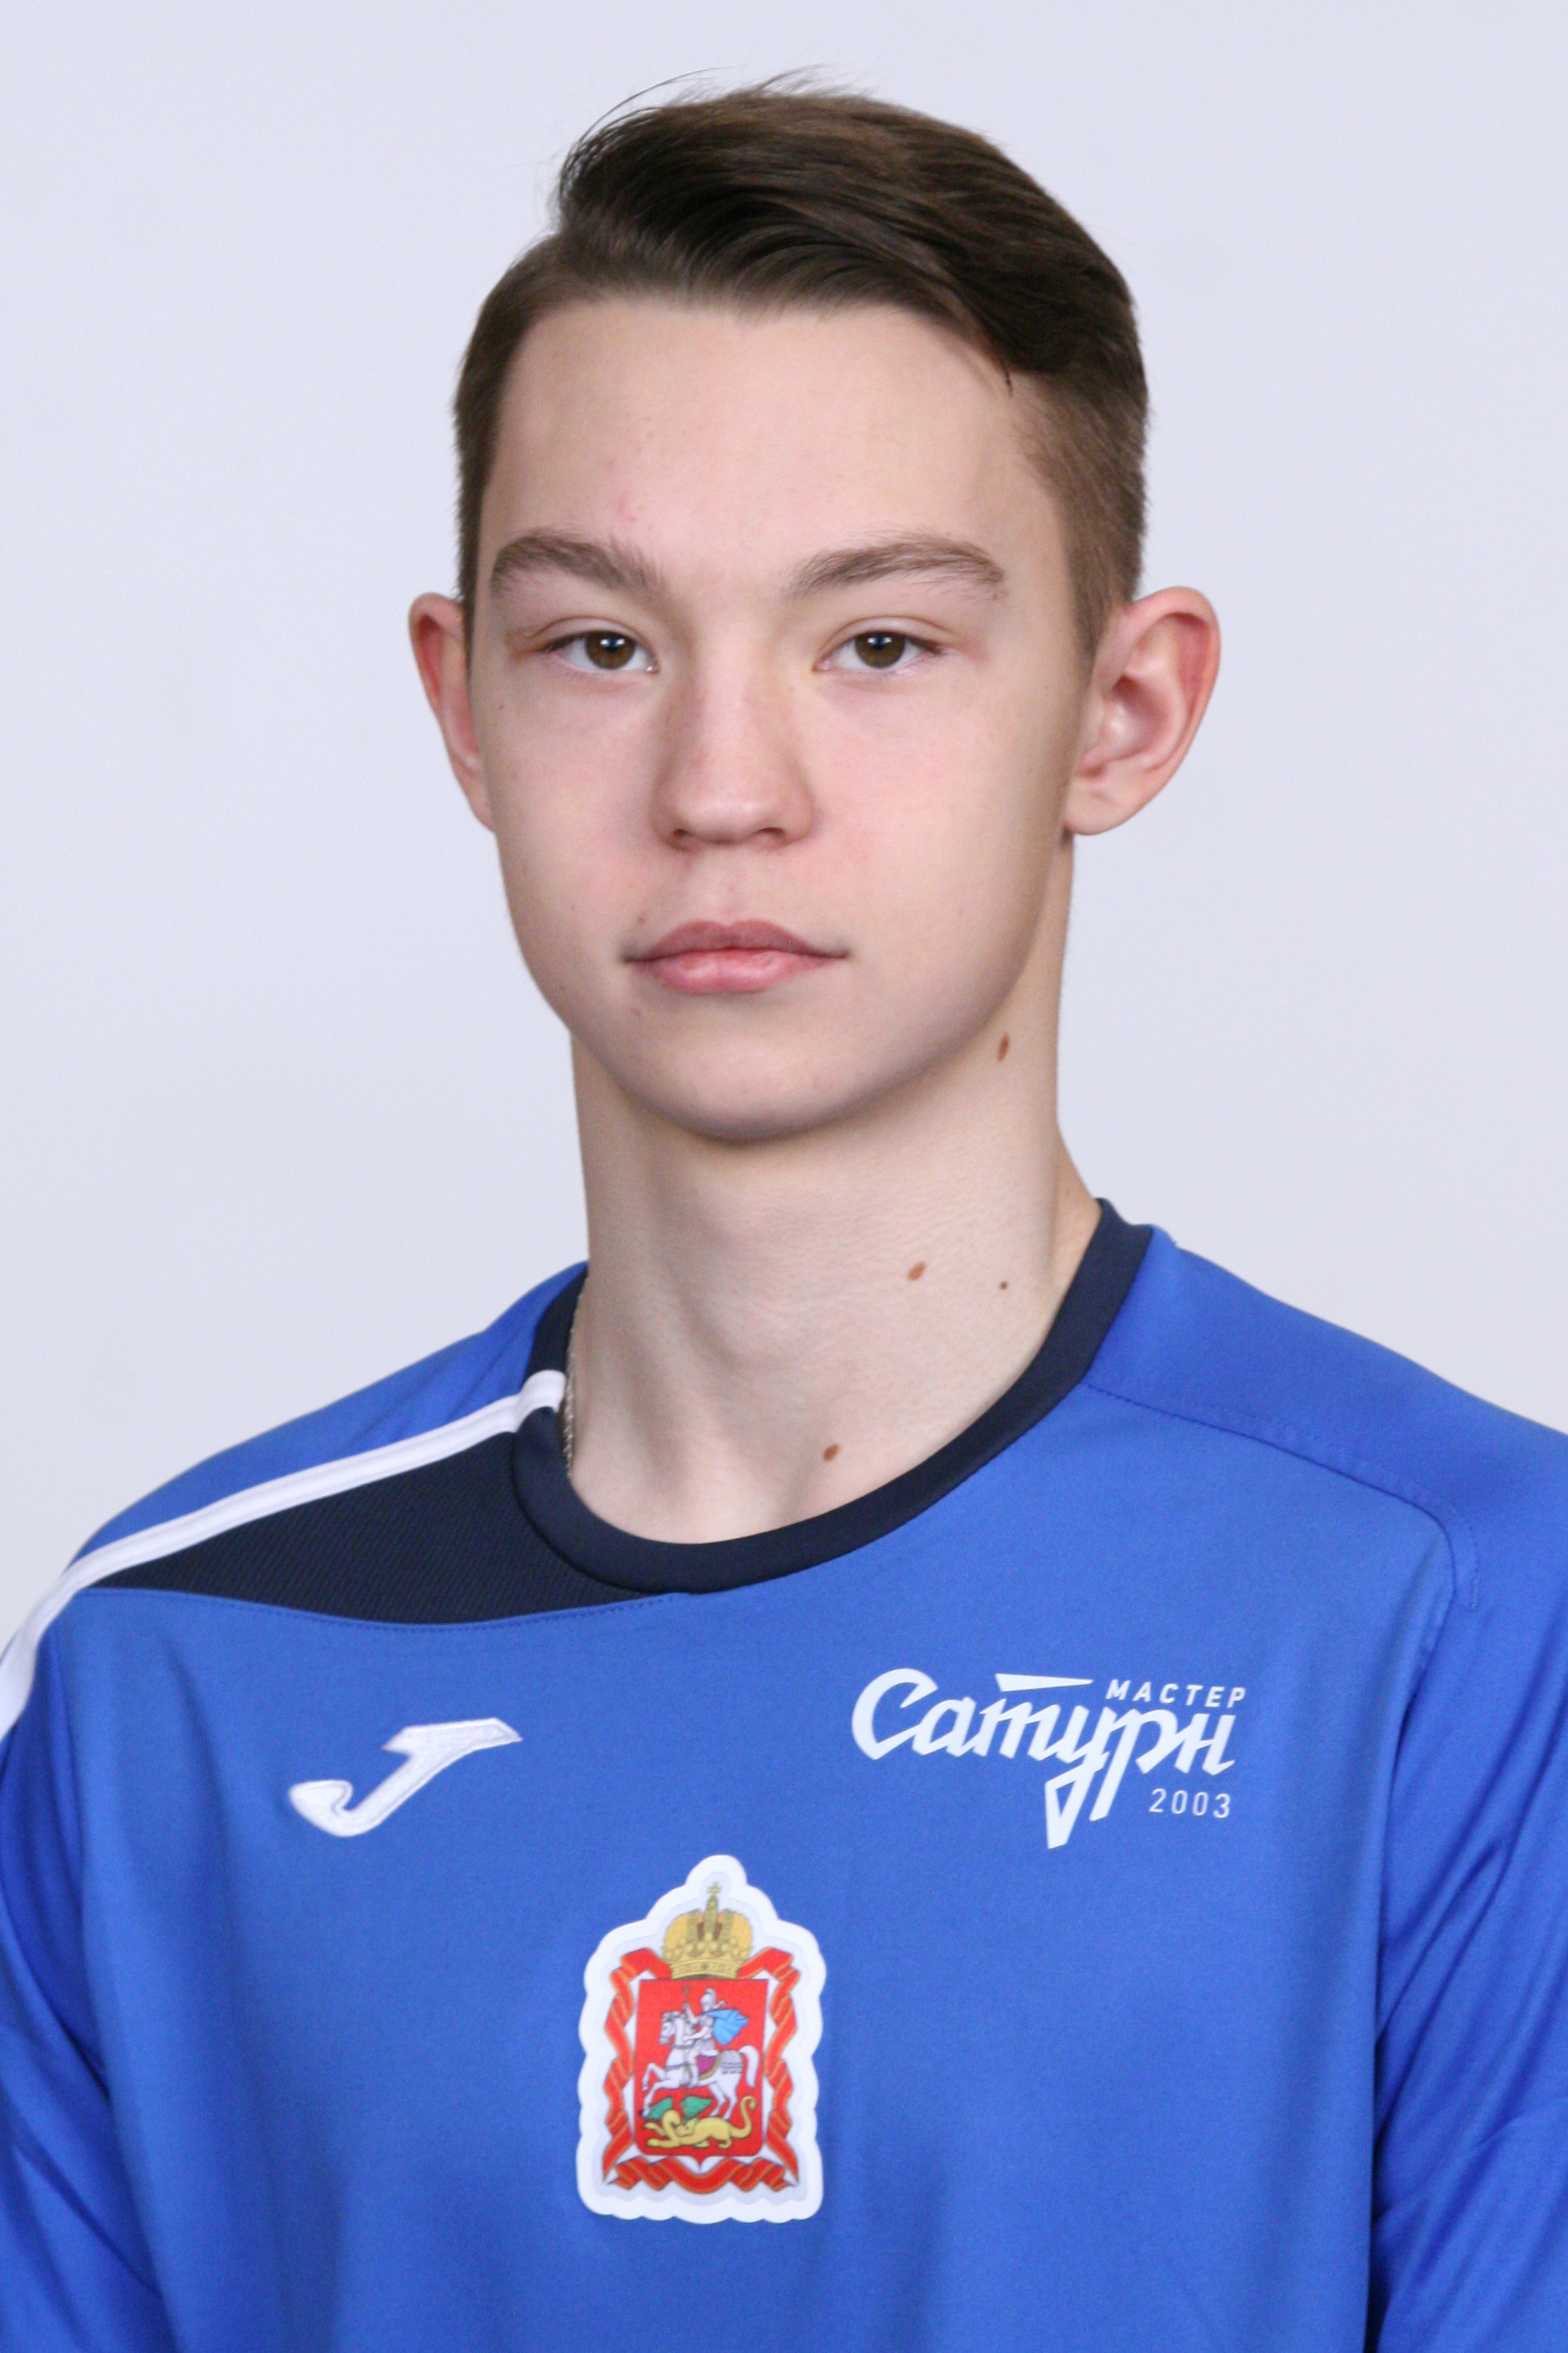 Мотовилов Фёдор Витальевич